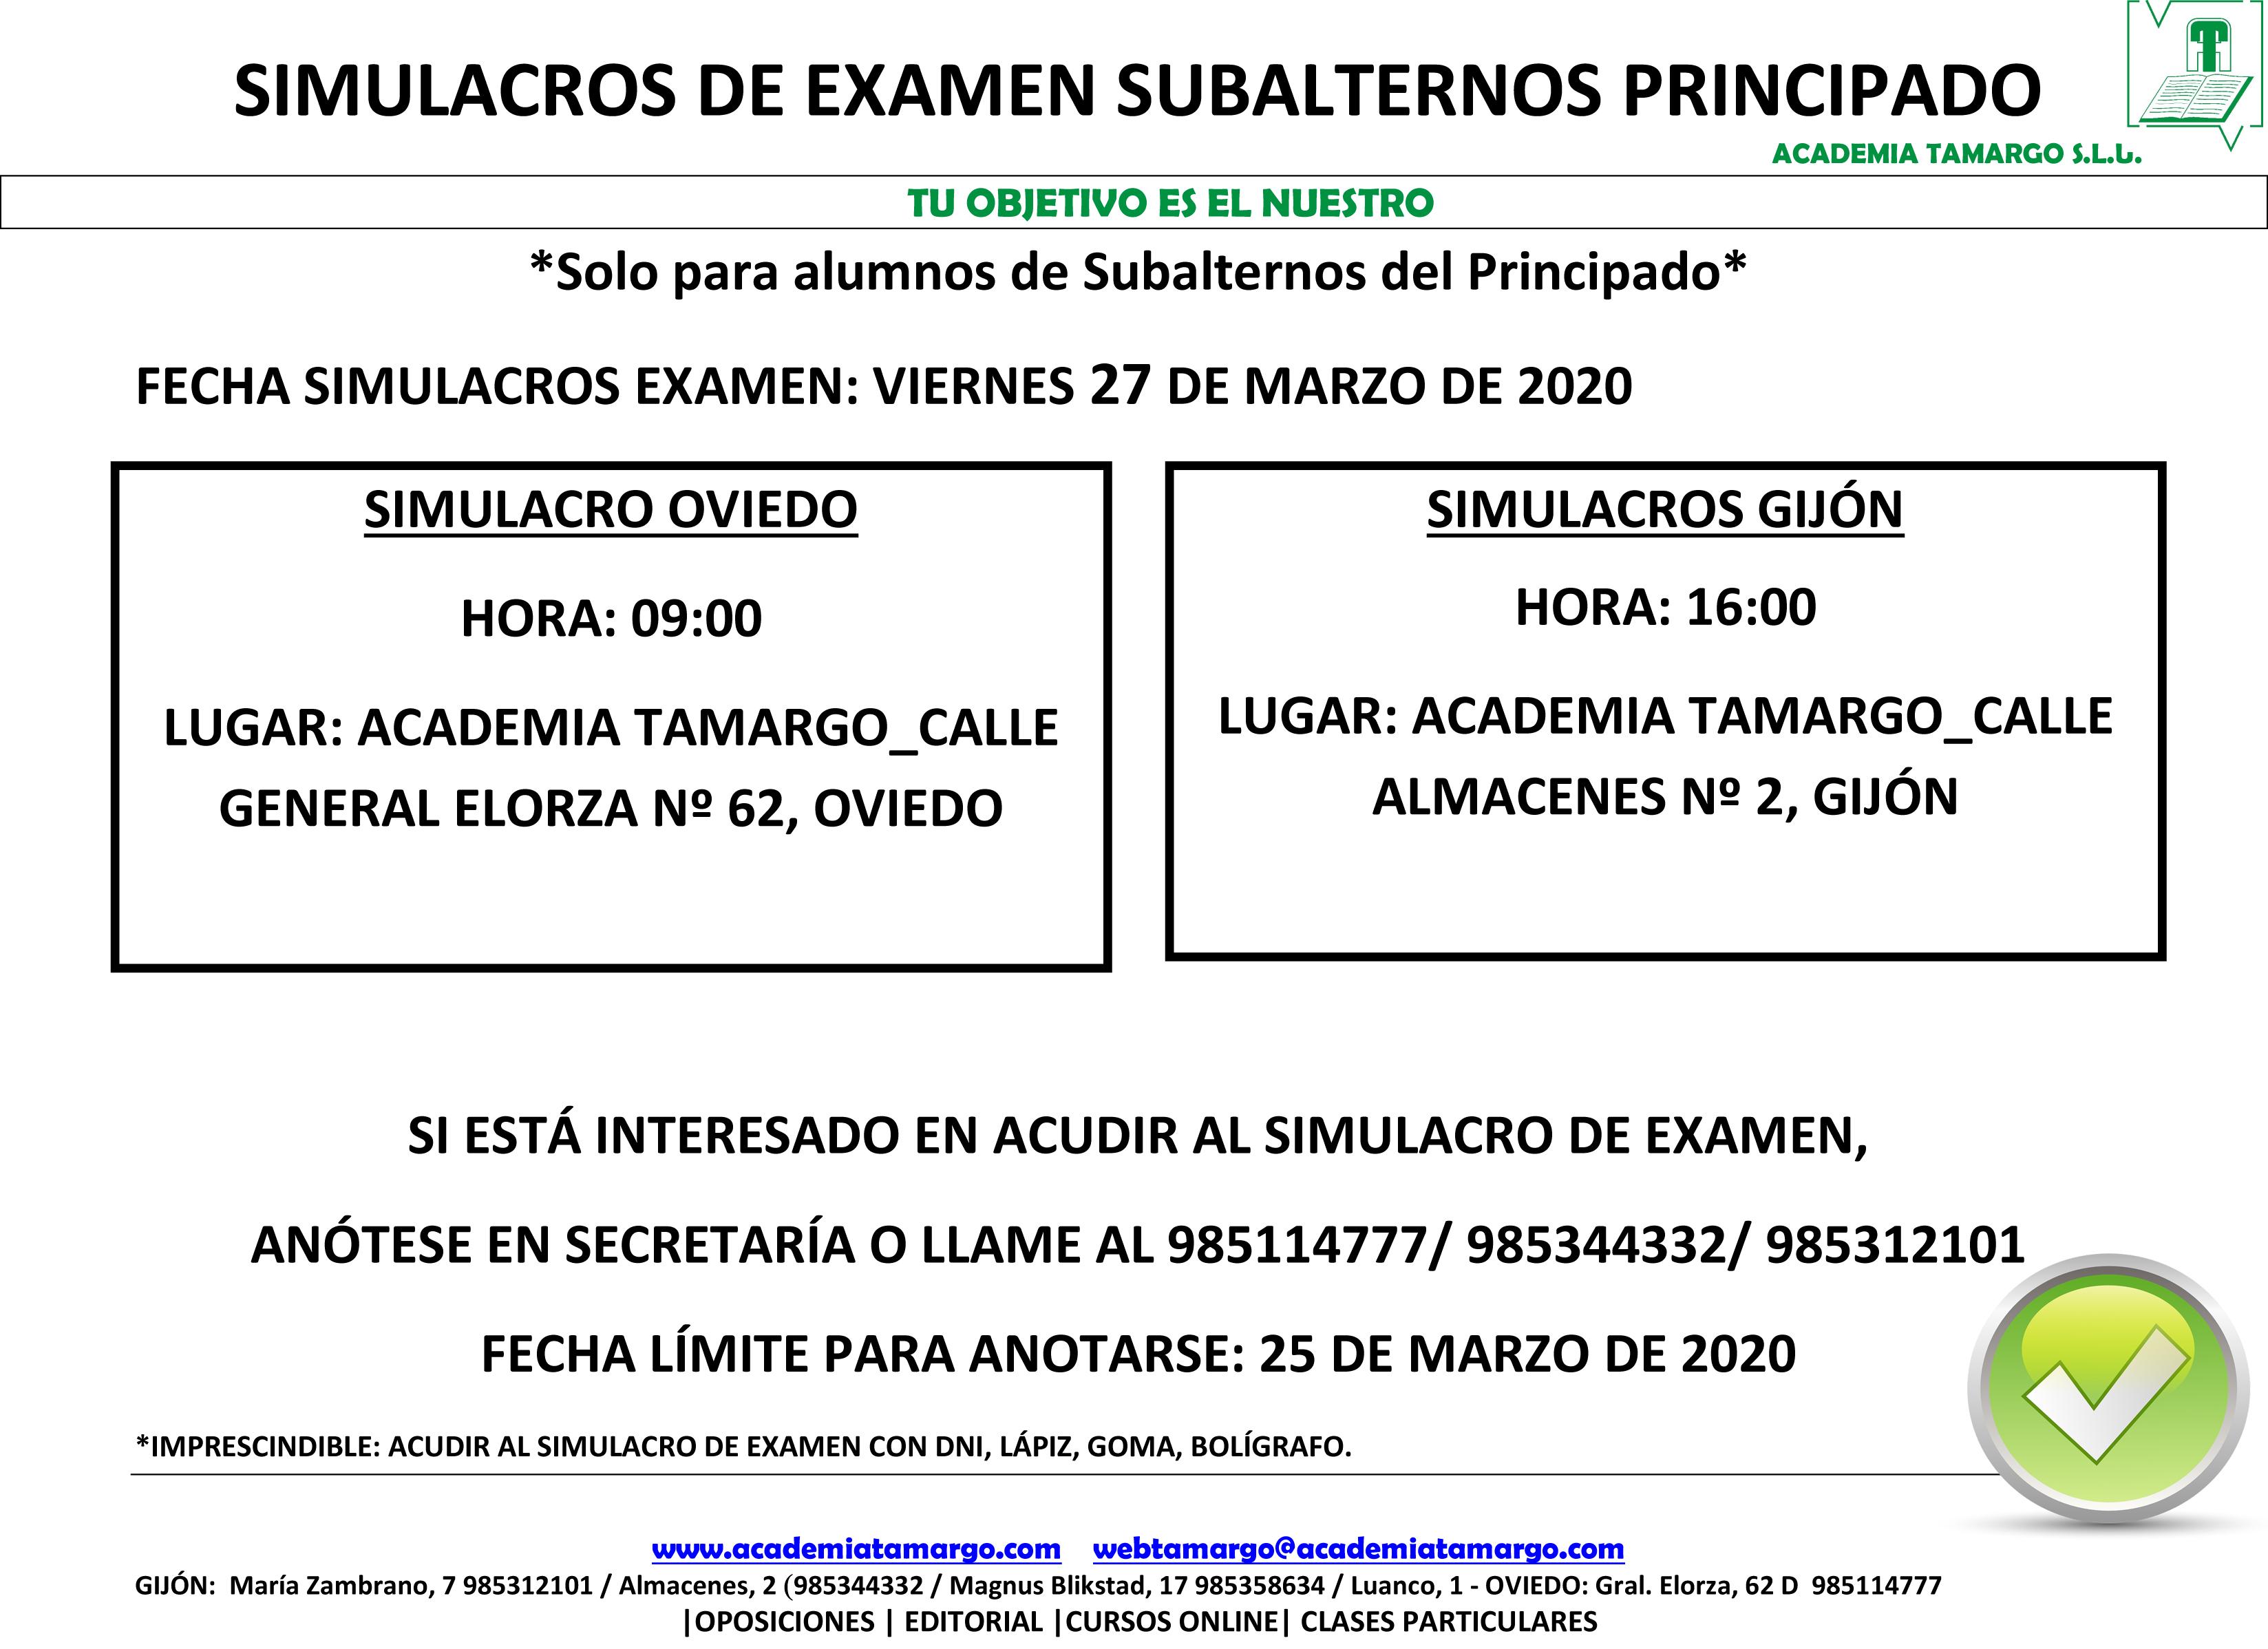 Microsoft Word – SIMULACRO SUBALTERNO PRINCIPADO MARZO 2020.docx